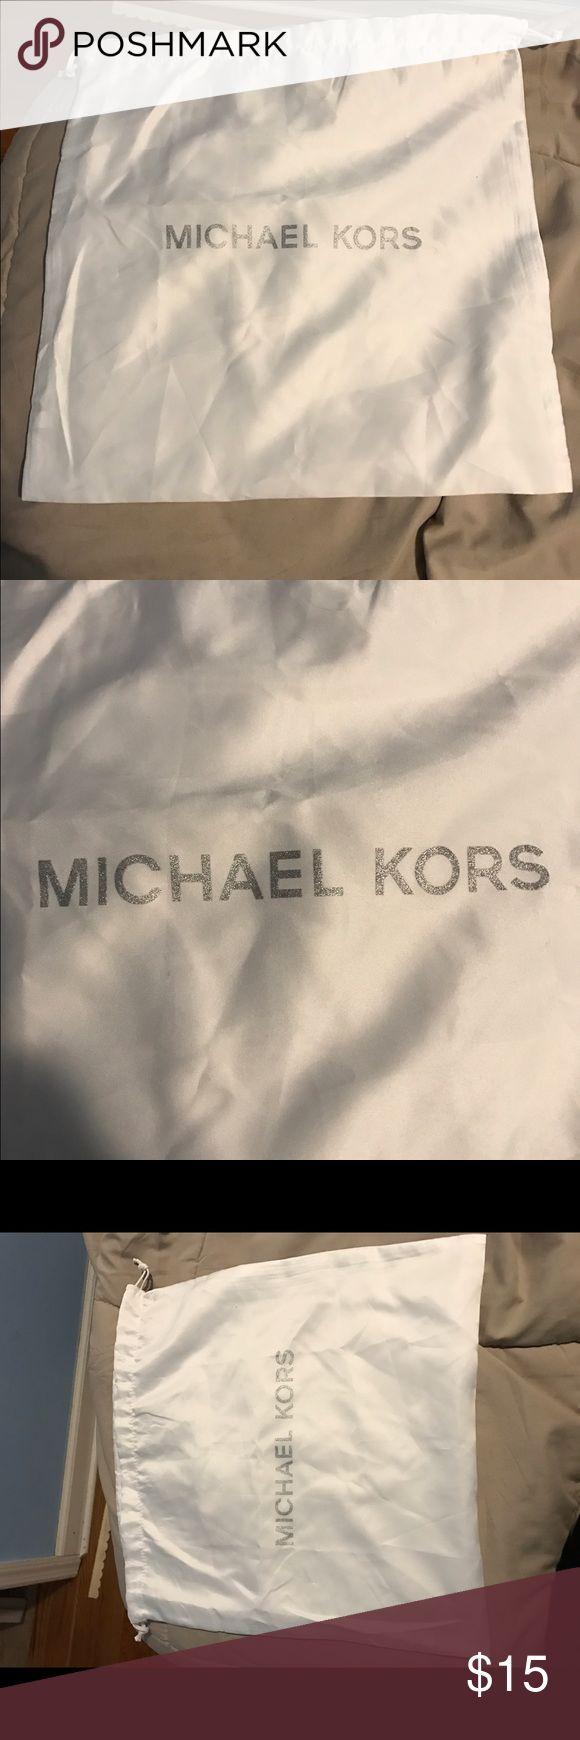 Mk dust bag. For medium size bag Mk dust bag.  For medium size bag. KORS Michael Kors Bags Shoulder Bags